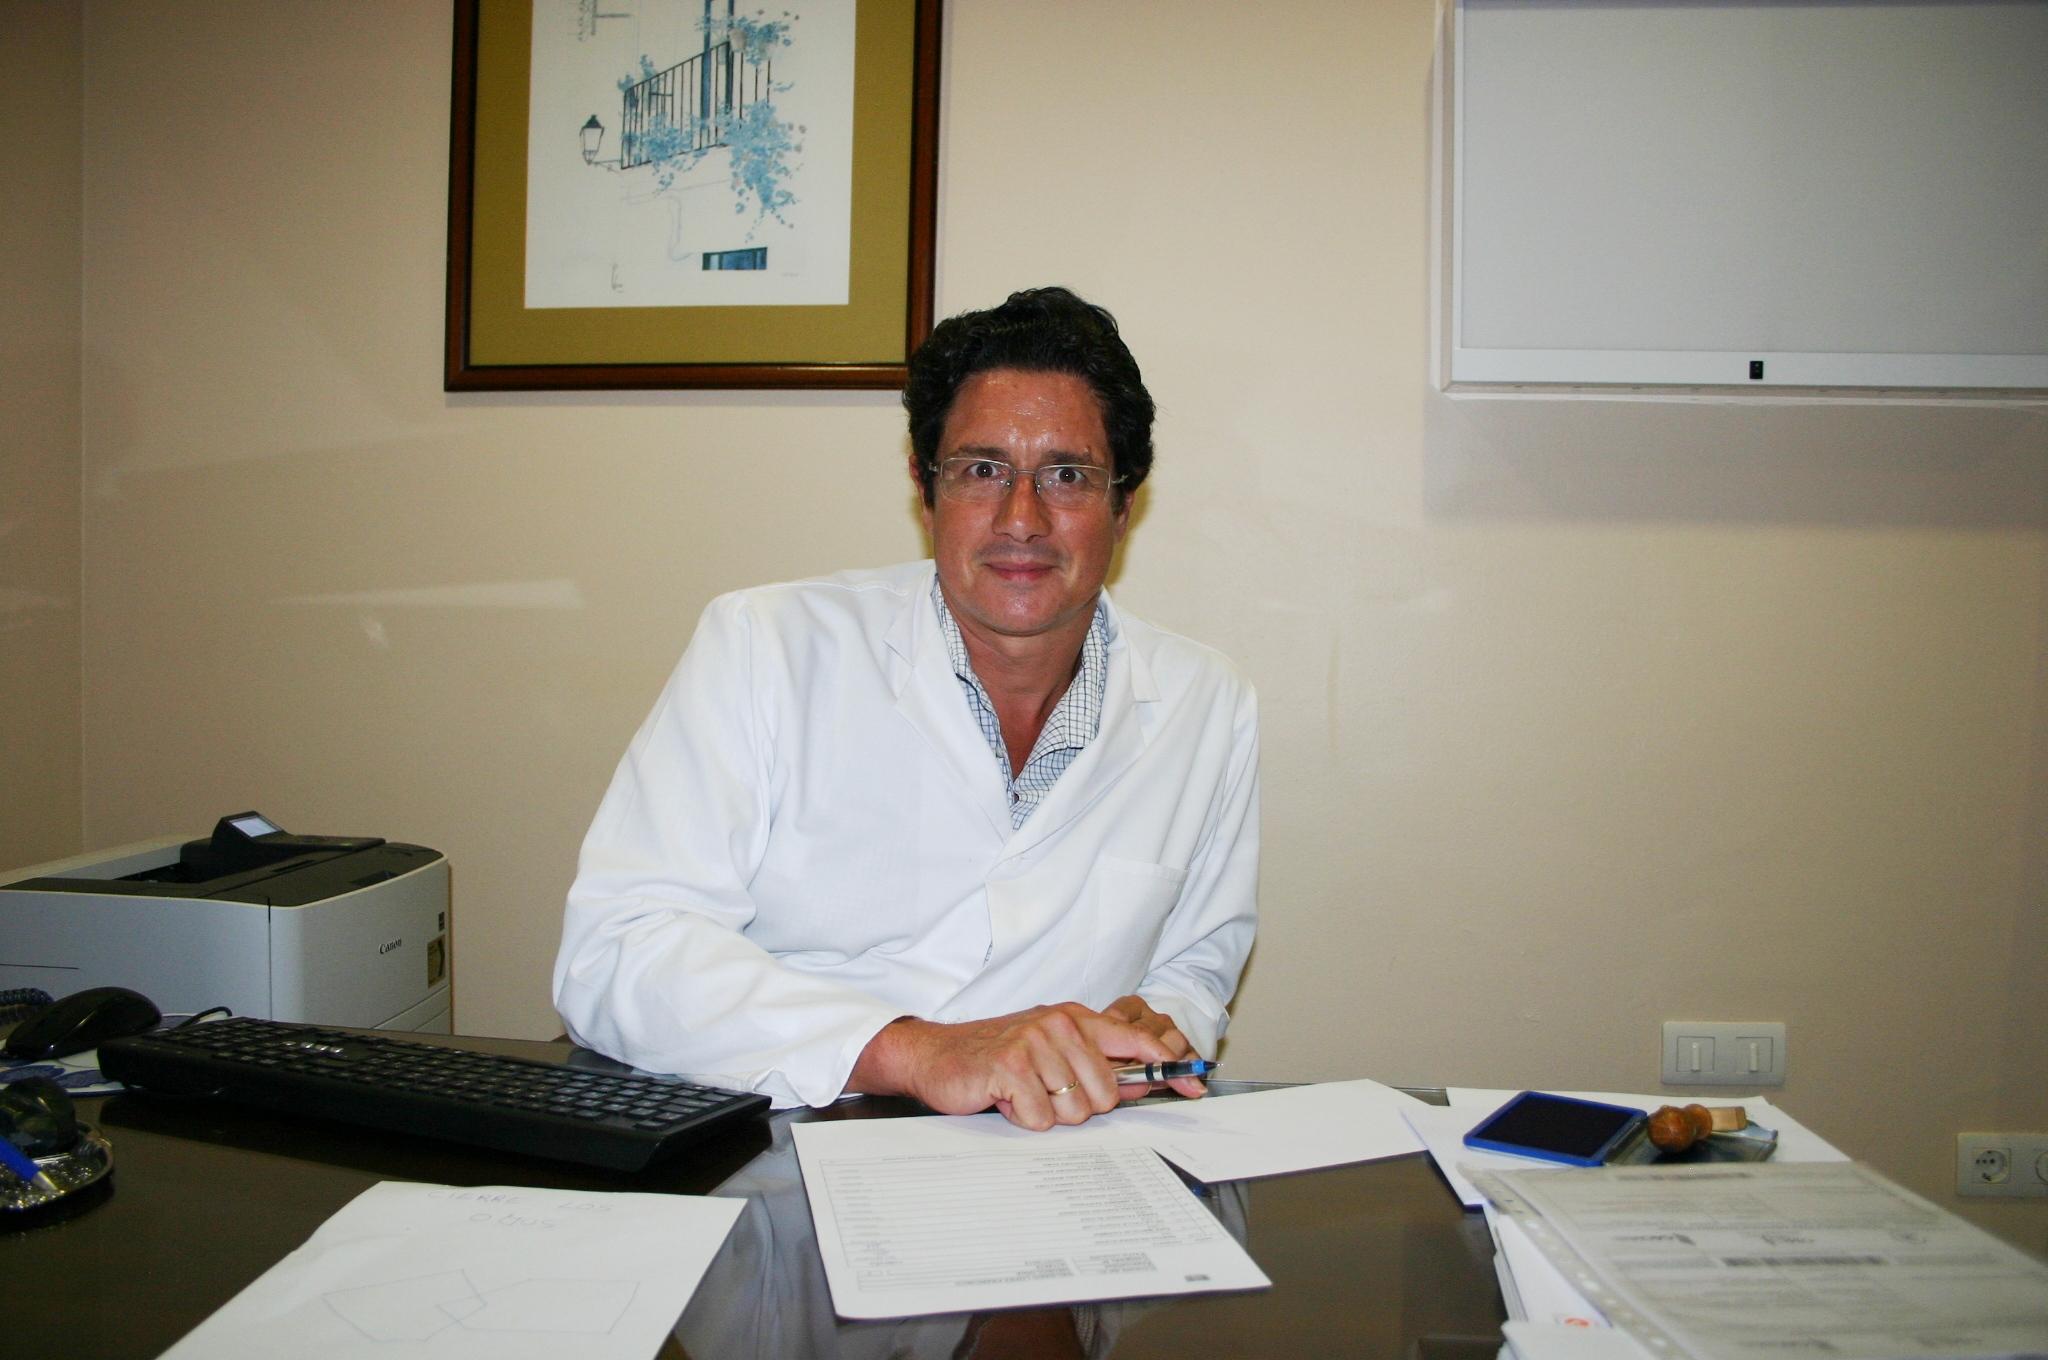 Dr. Francisco Delgado López